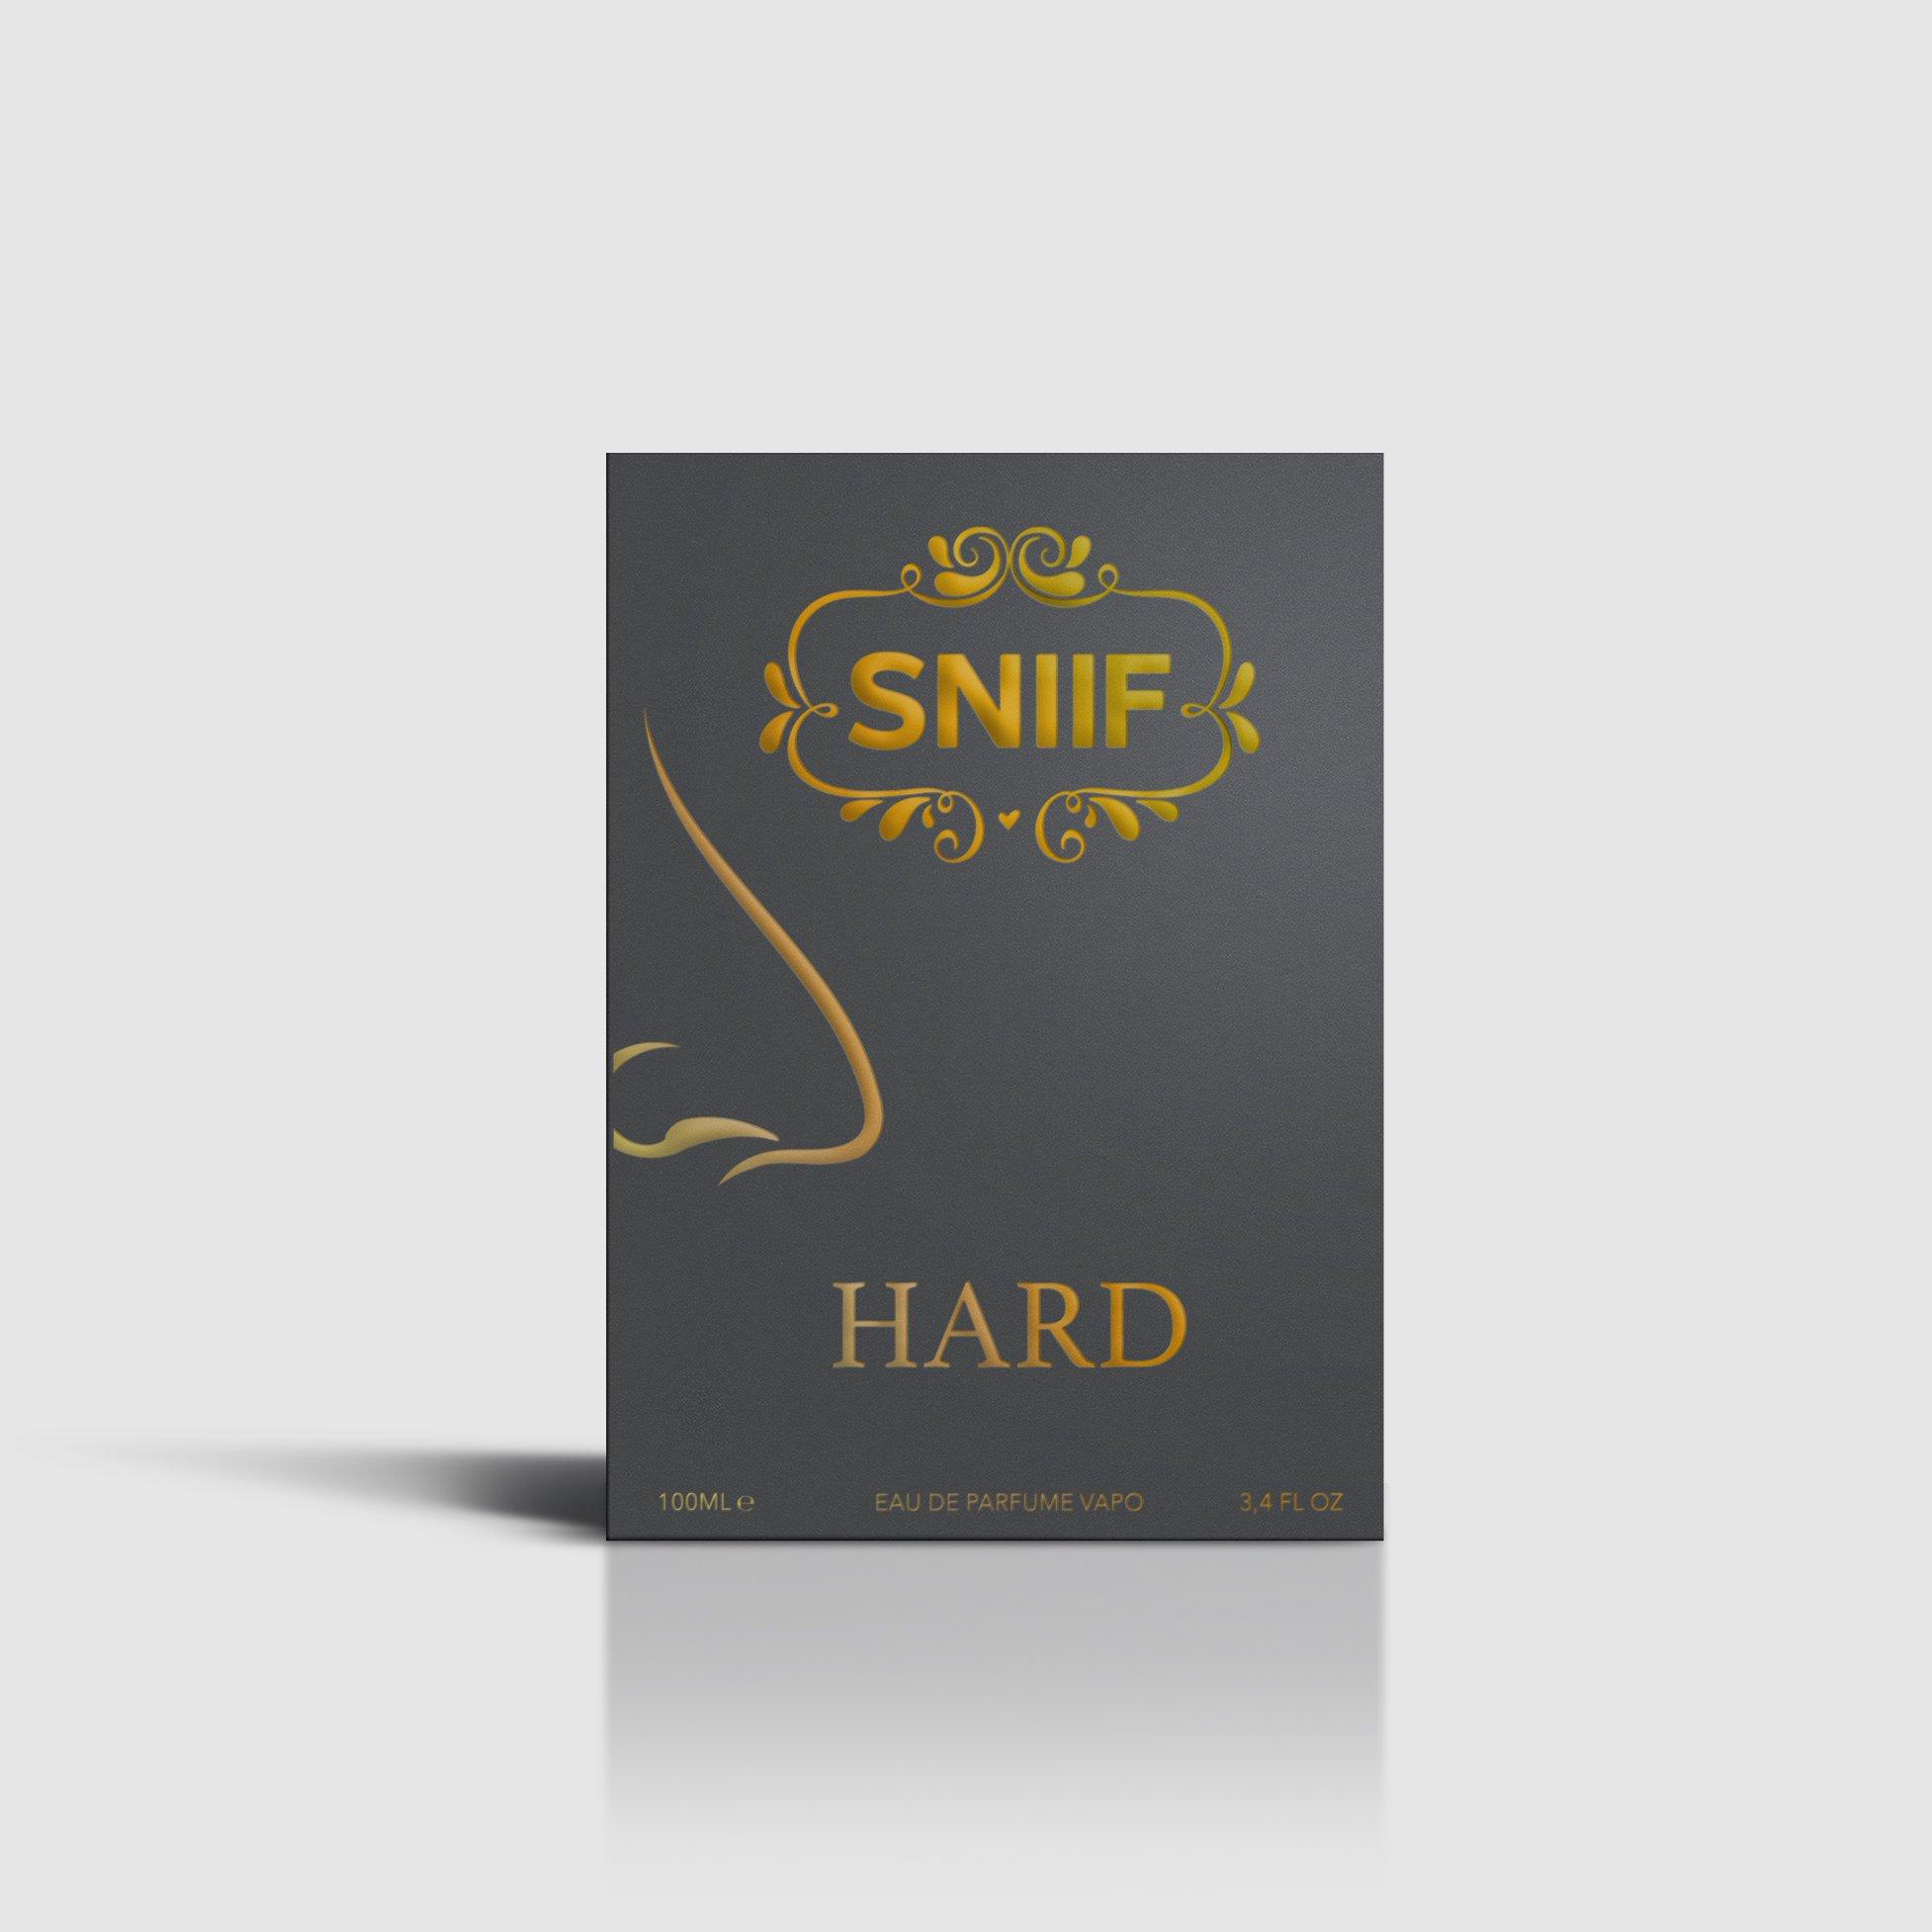 Sniif Profumi Hard 100ml